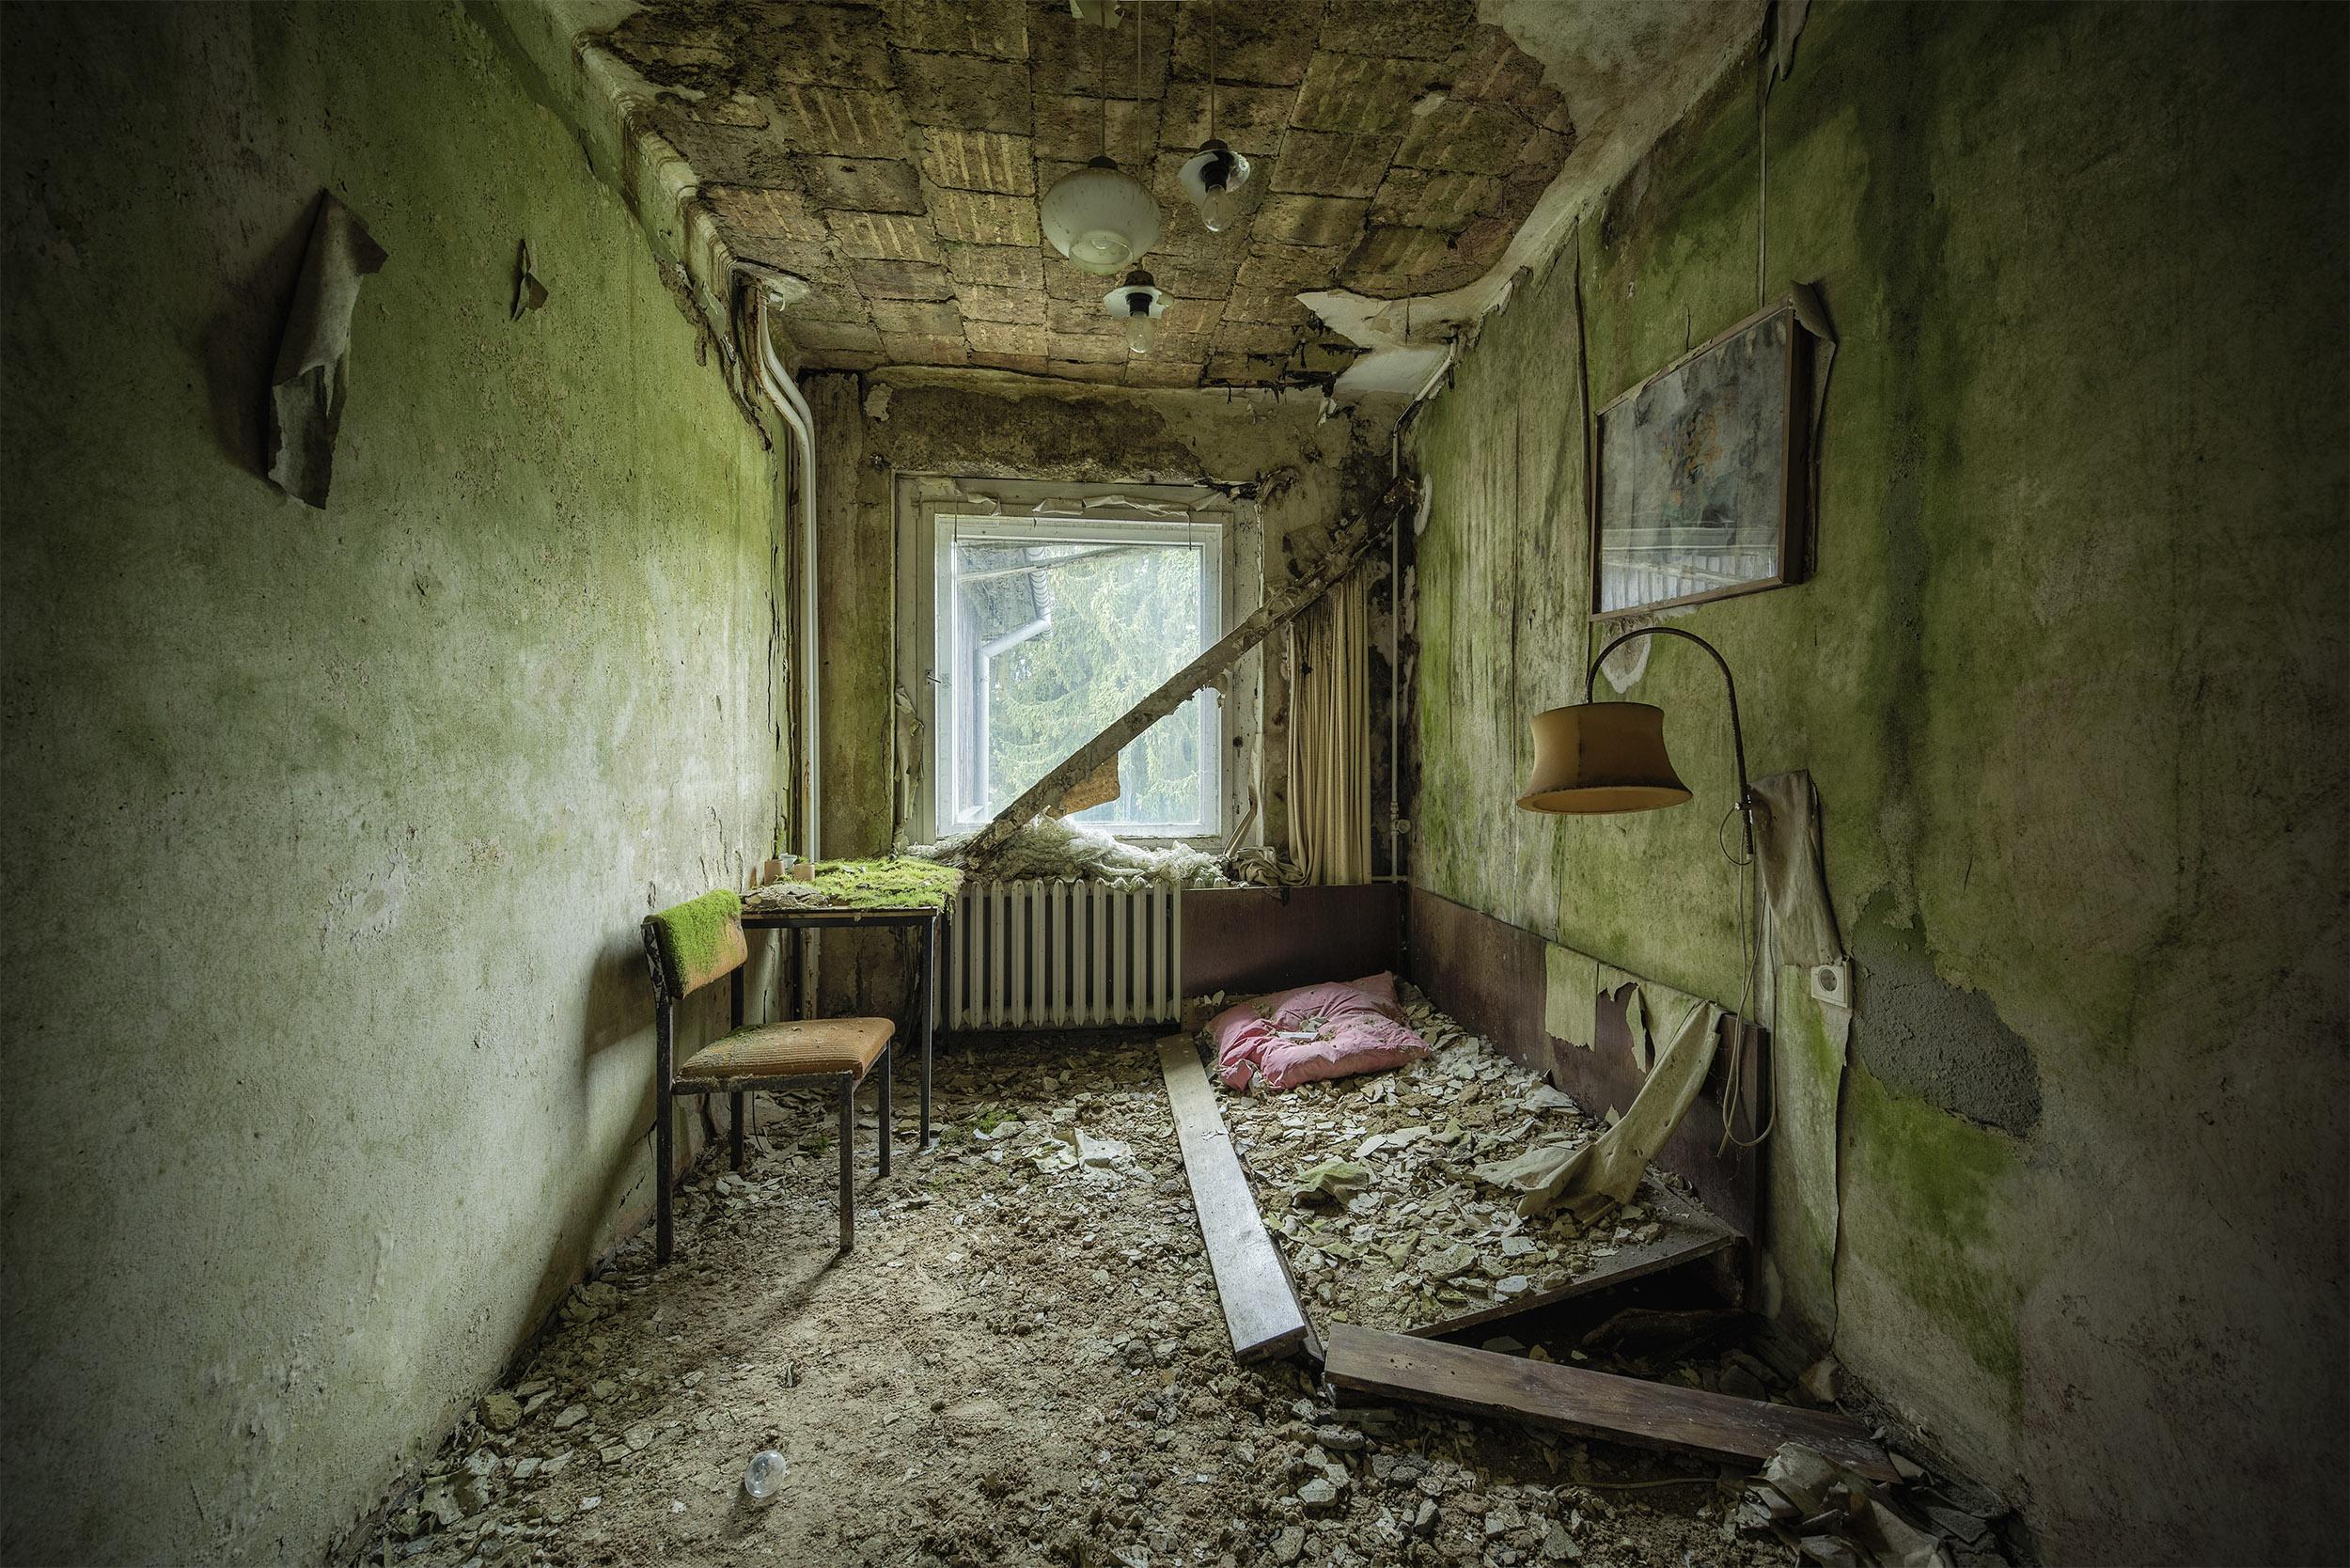 Peter Untermaierhofer ArtShouldTempt Photography Pic 7